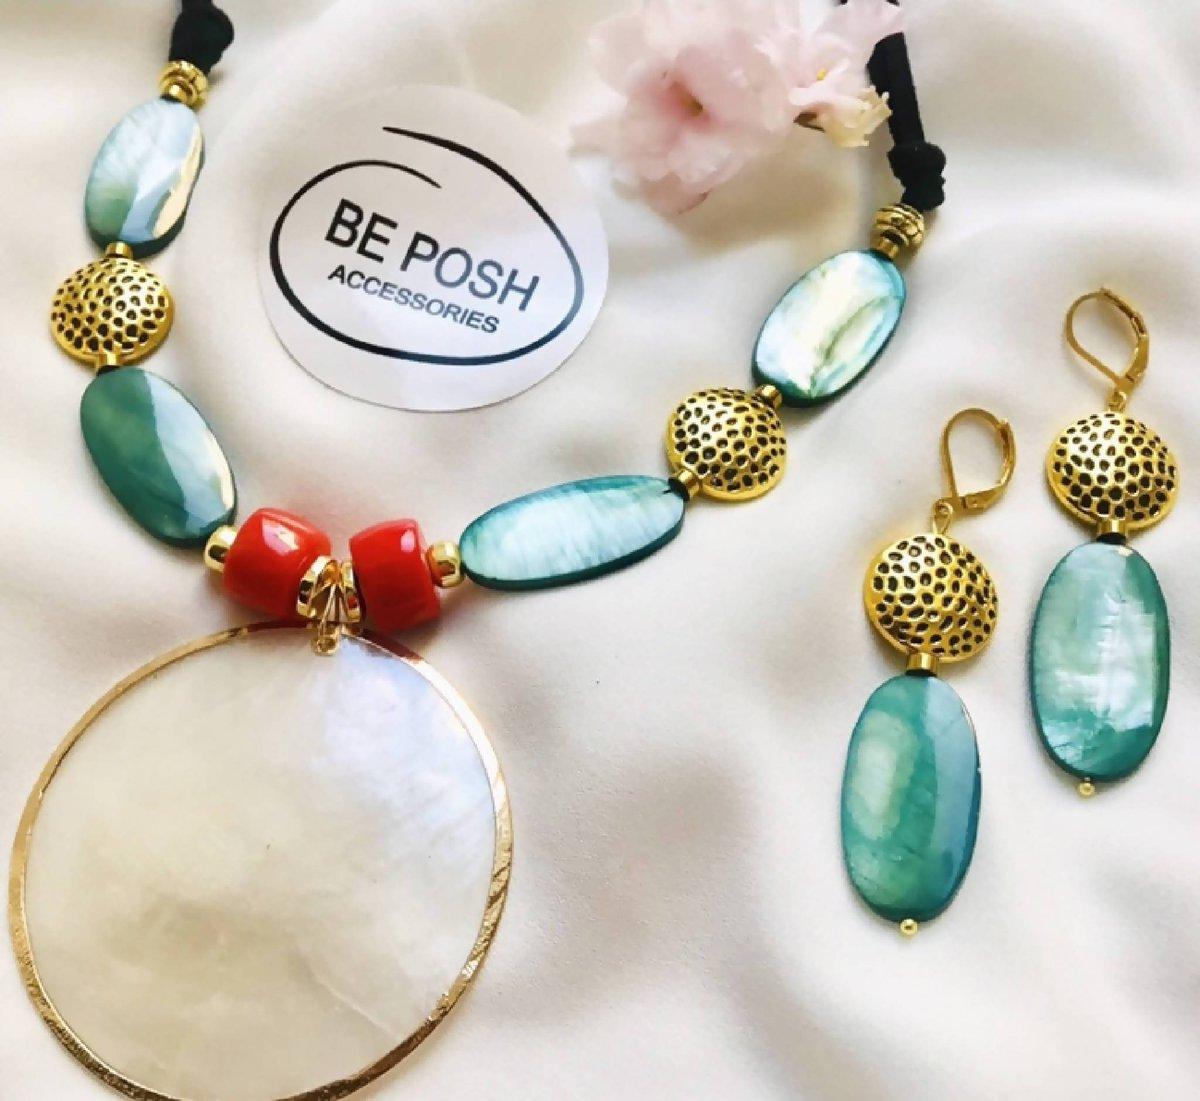 Are you? ... Posh?  🛍   #jewelry #fashion #style #jewellery #accessories #beautiful #jewelrygram #design #instajewelry #jewelryaddict #shopping #finejewelry #photooftheday #instafashion #beauty #bracelet #silver #madeingeorgia #shopgeorgian #ქართული #აჩუქე